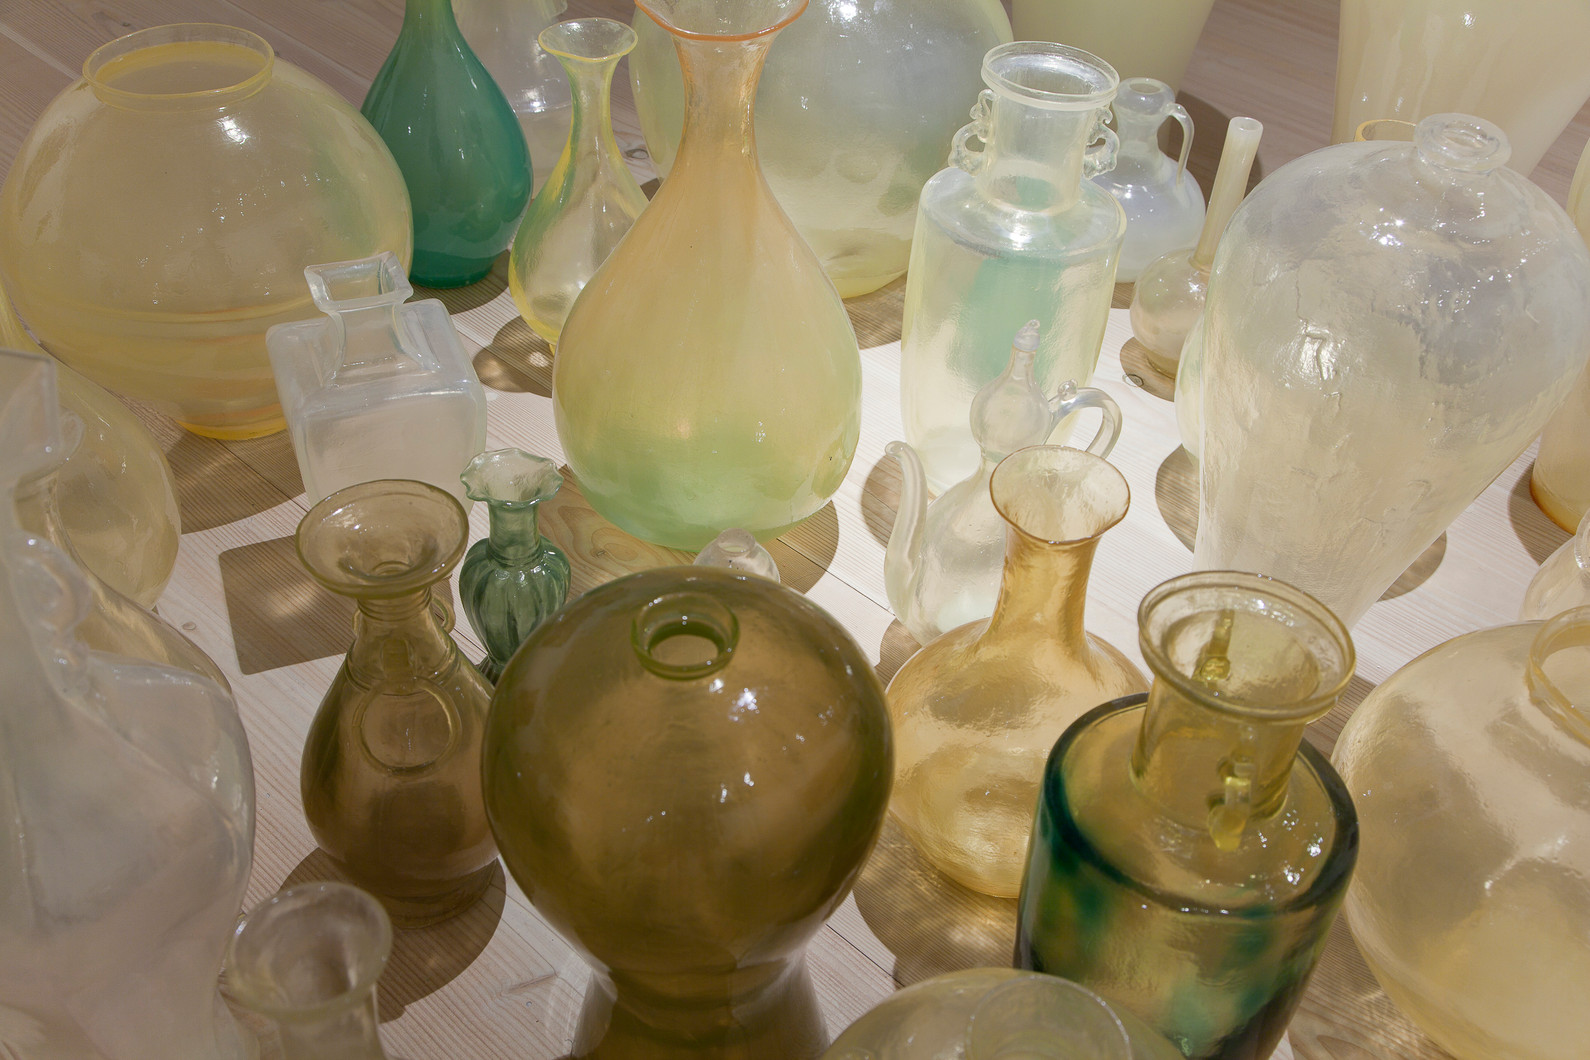 Installationview, Fantastic Ordinary, Saatchi Gallery